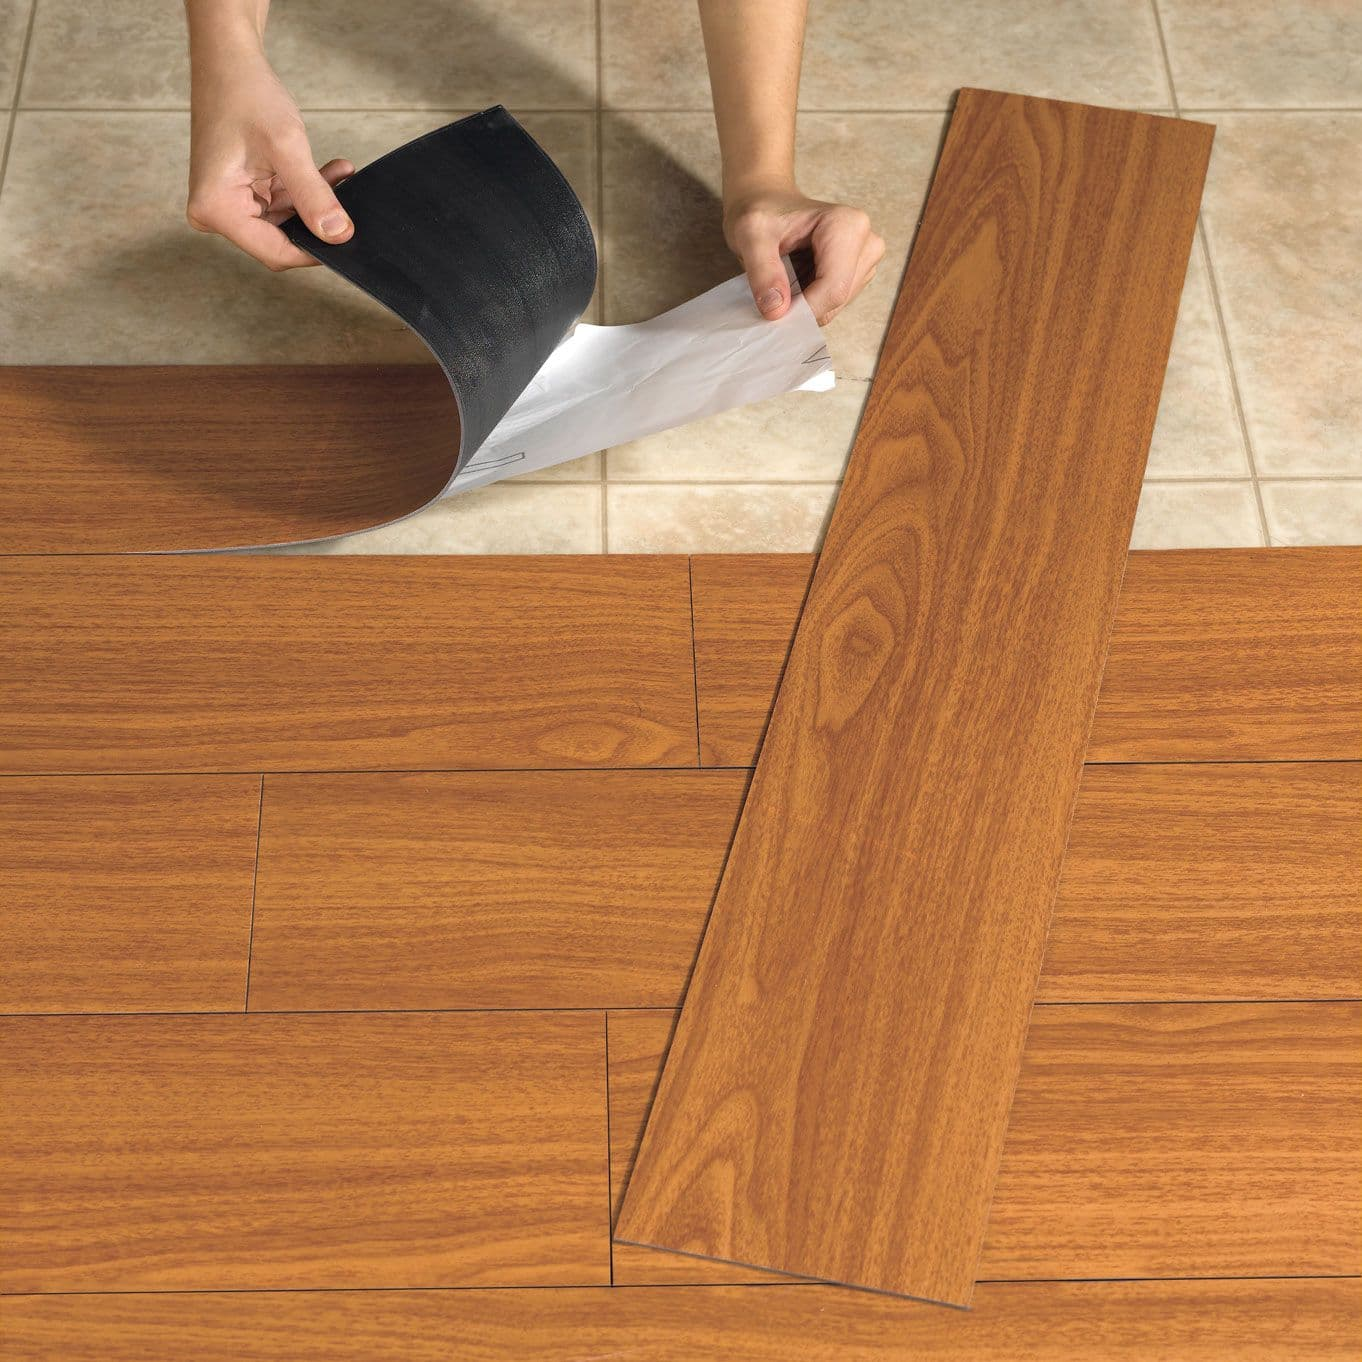 Укладка плитки на клеевой основе